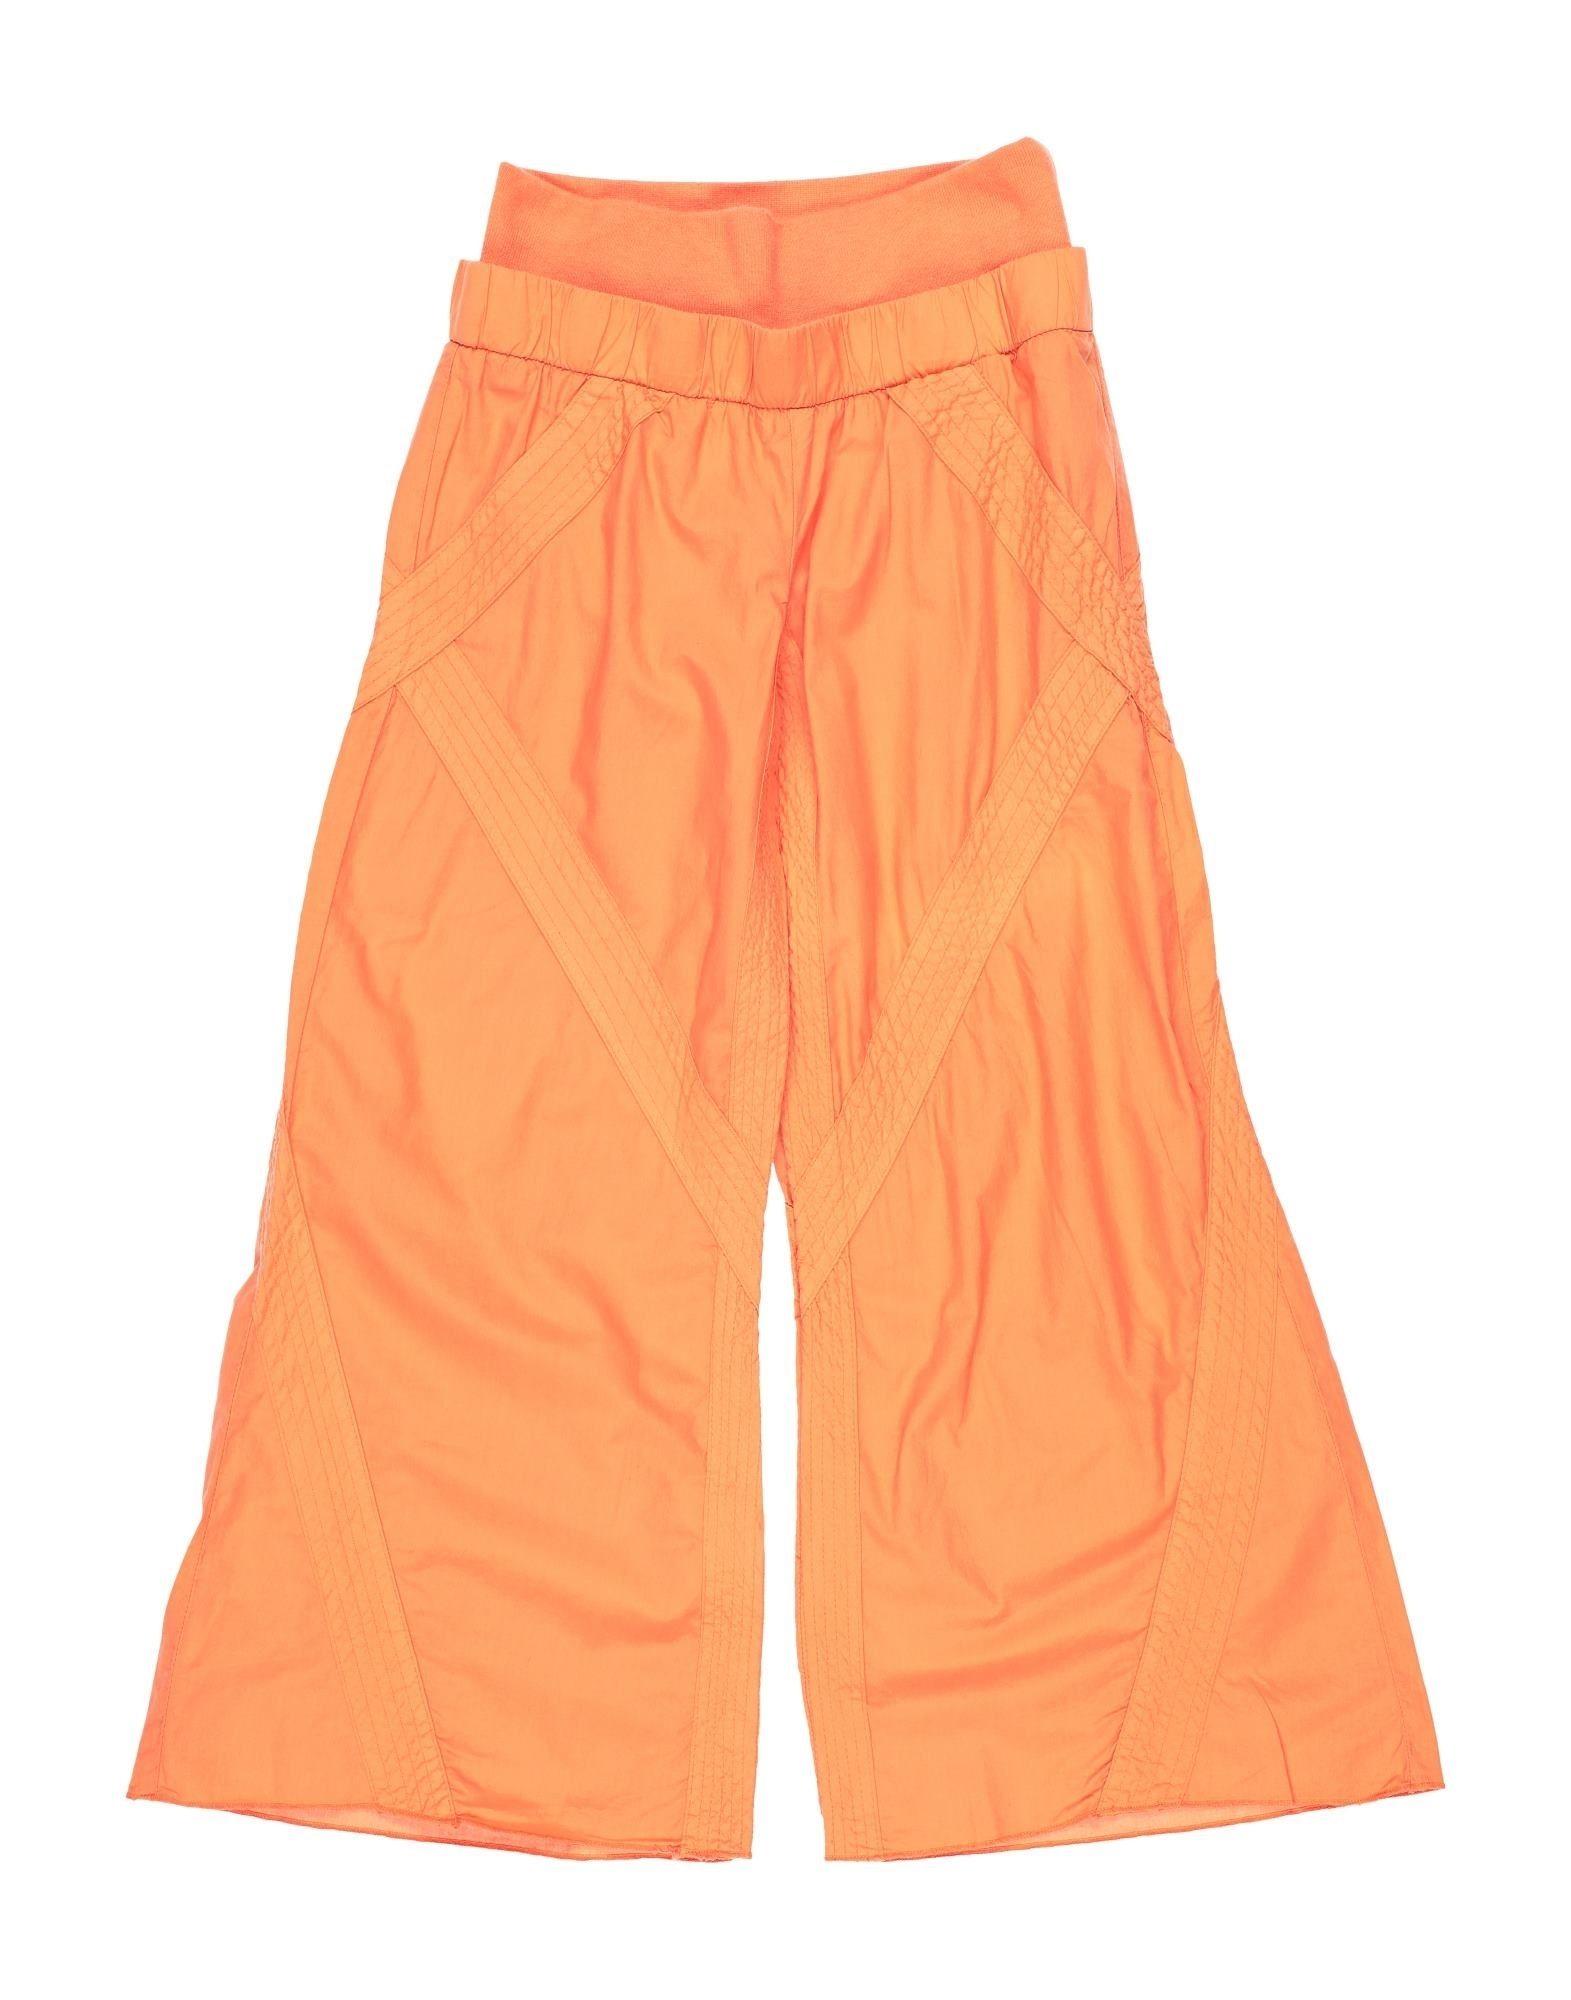 Nolita Pocket Kids' Casual Pants In Orange